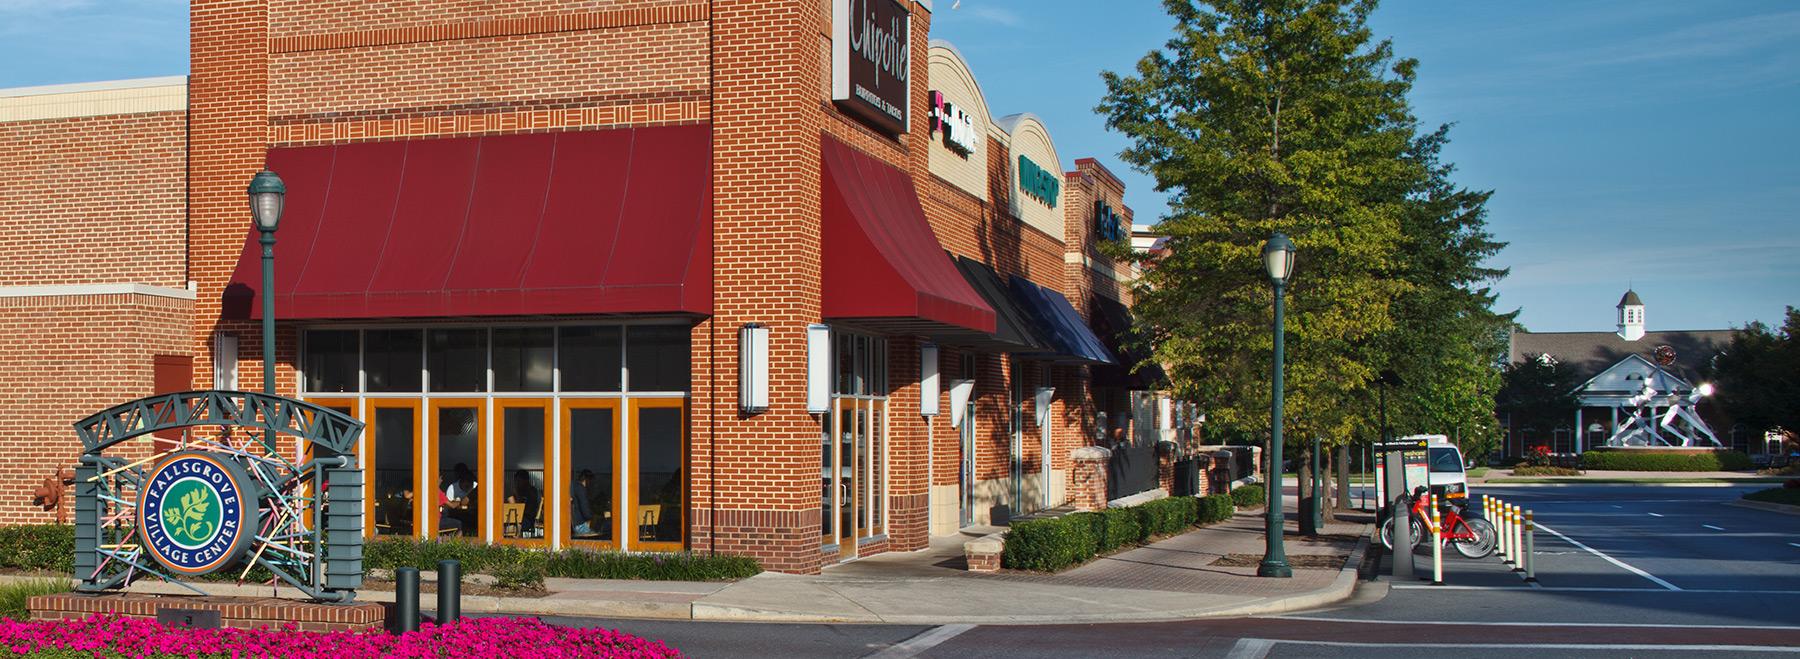 shopping center in rockville md fallsgrove village center